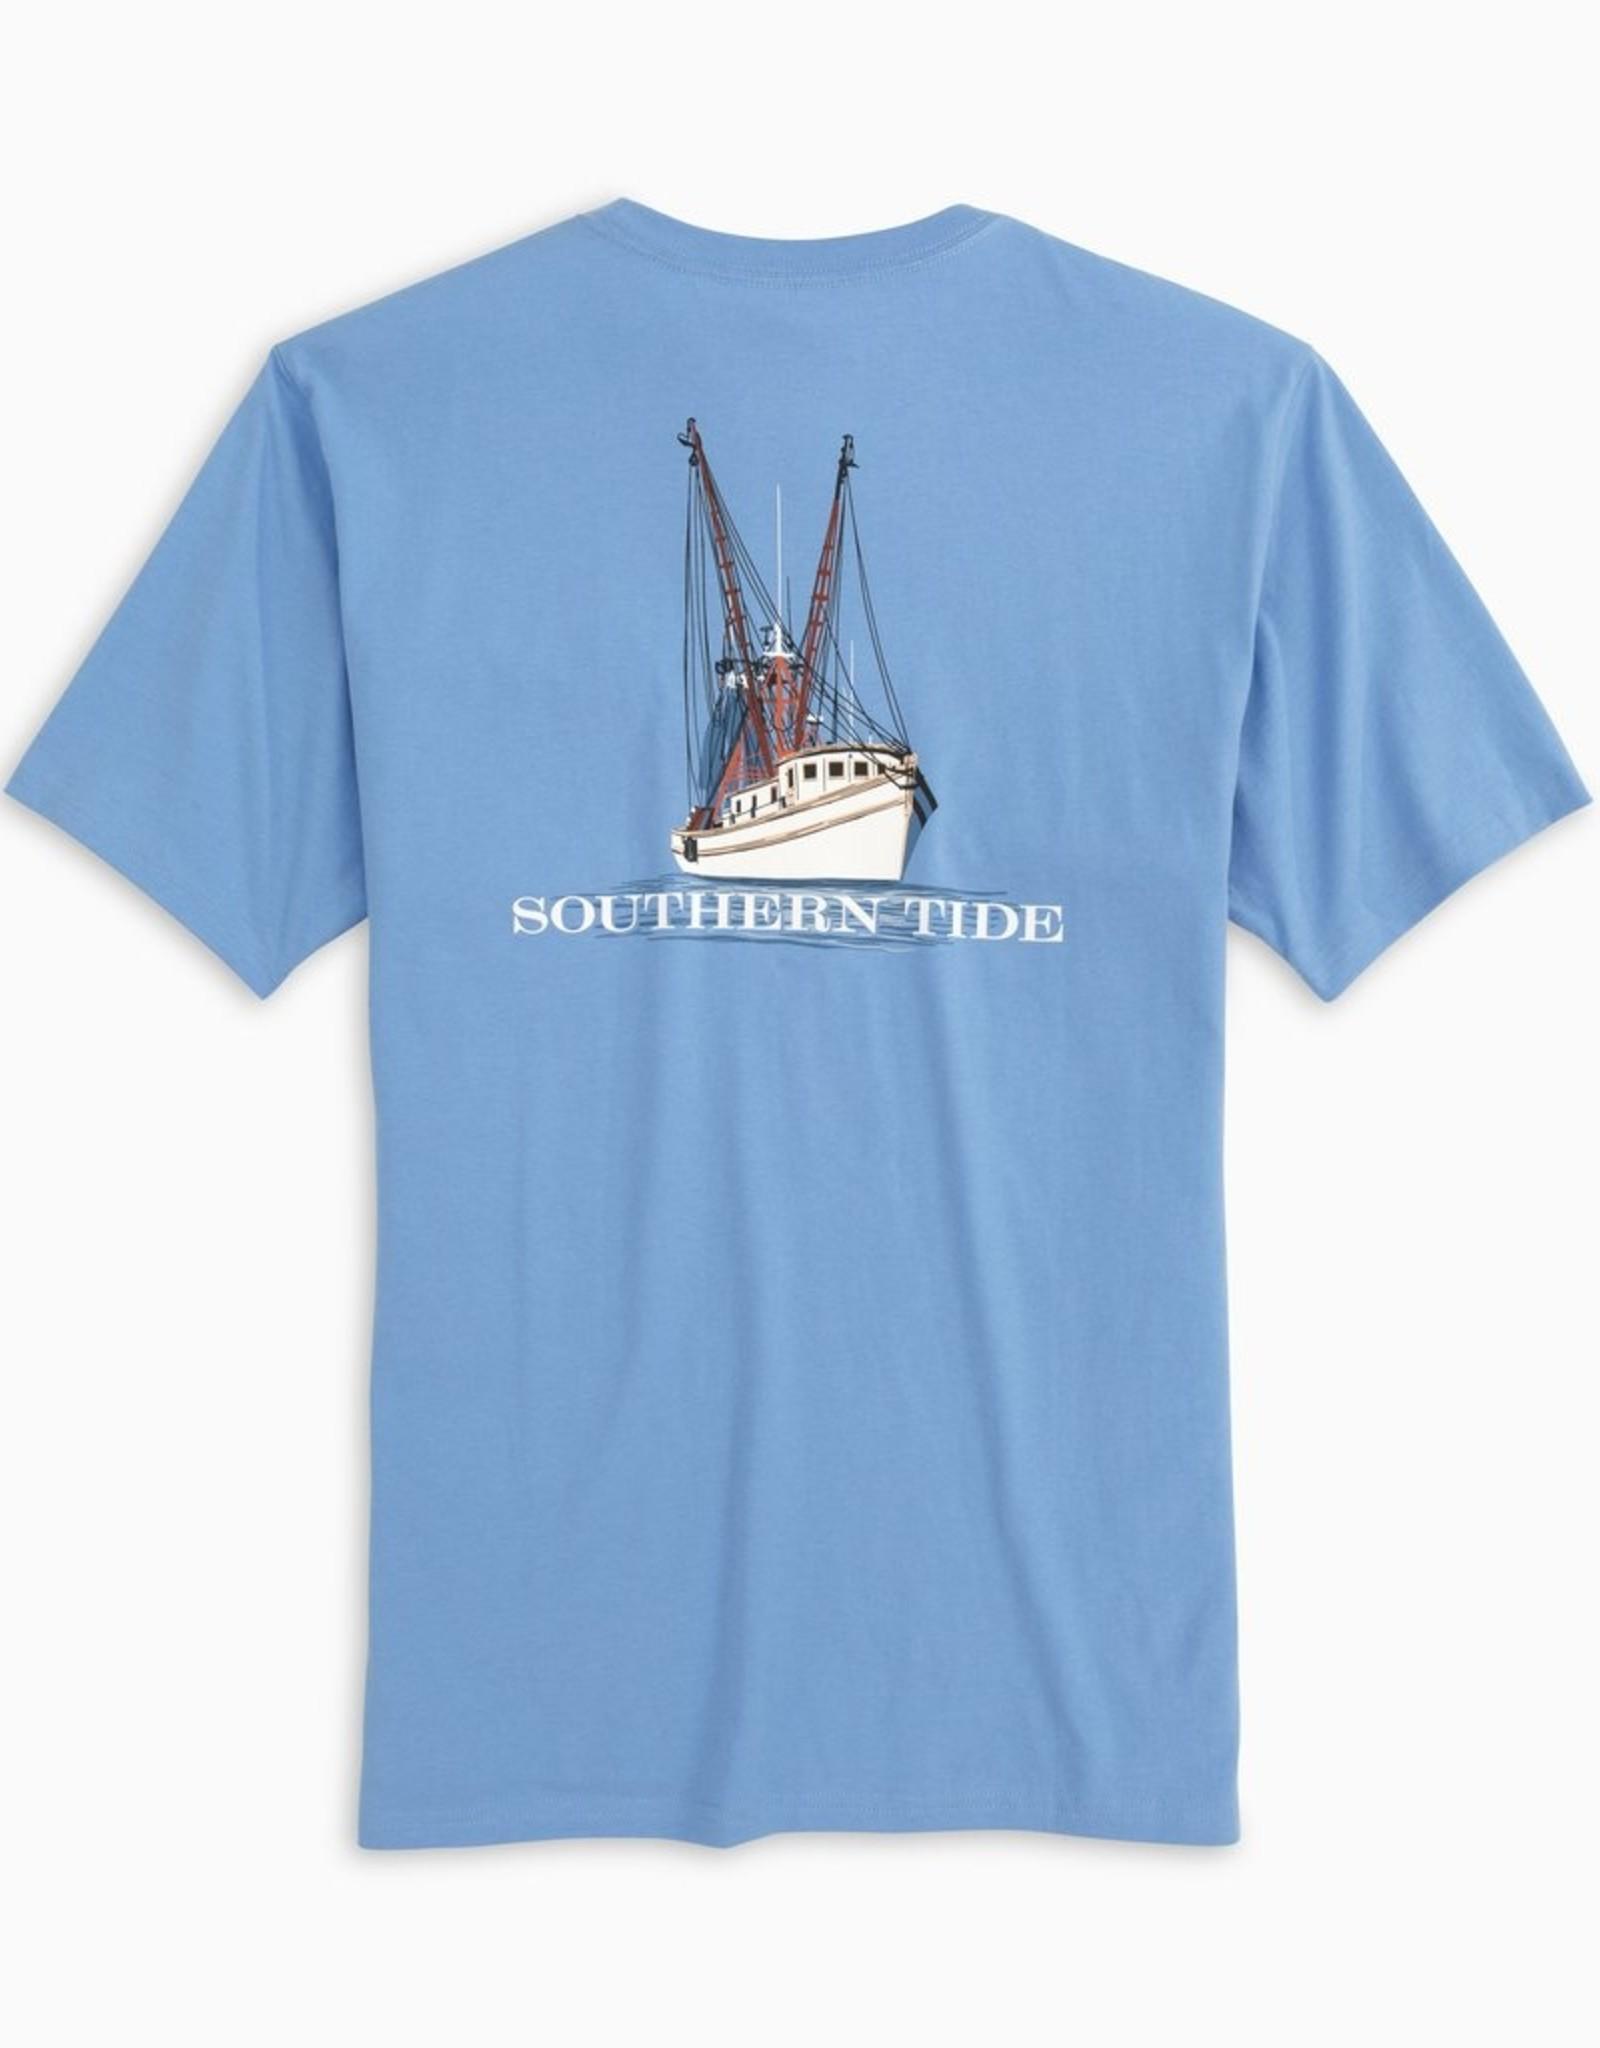 Southern Tide Shrimp Boat Tee